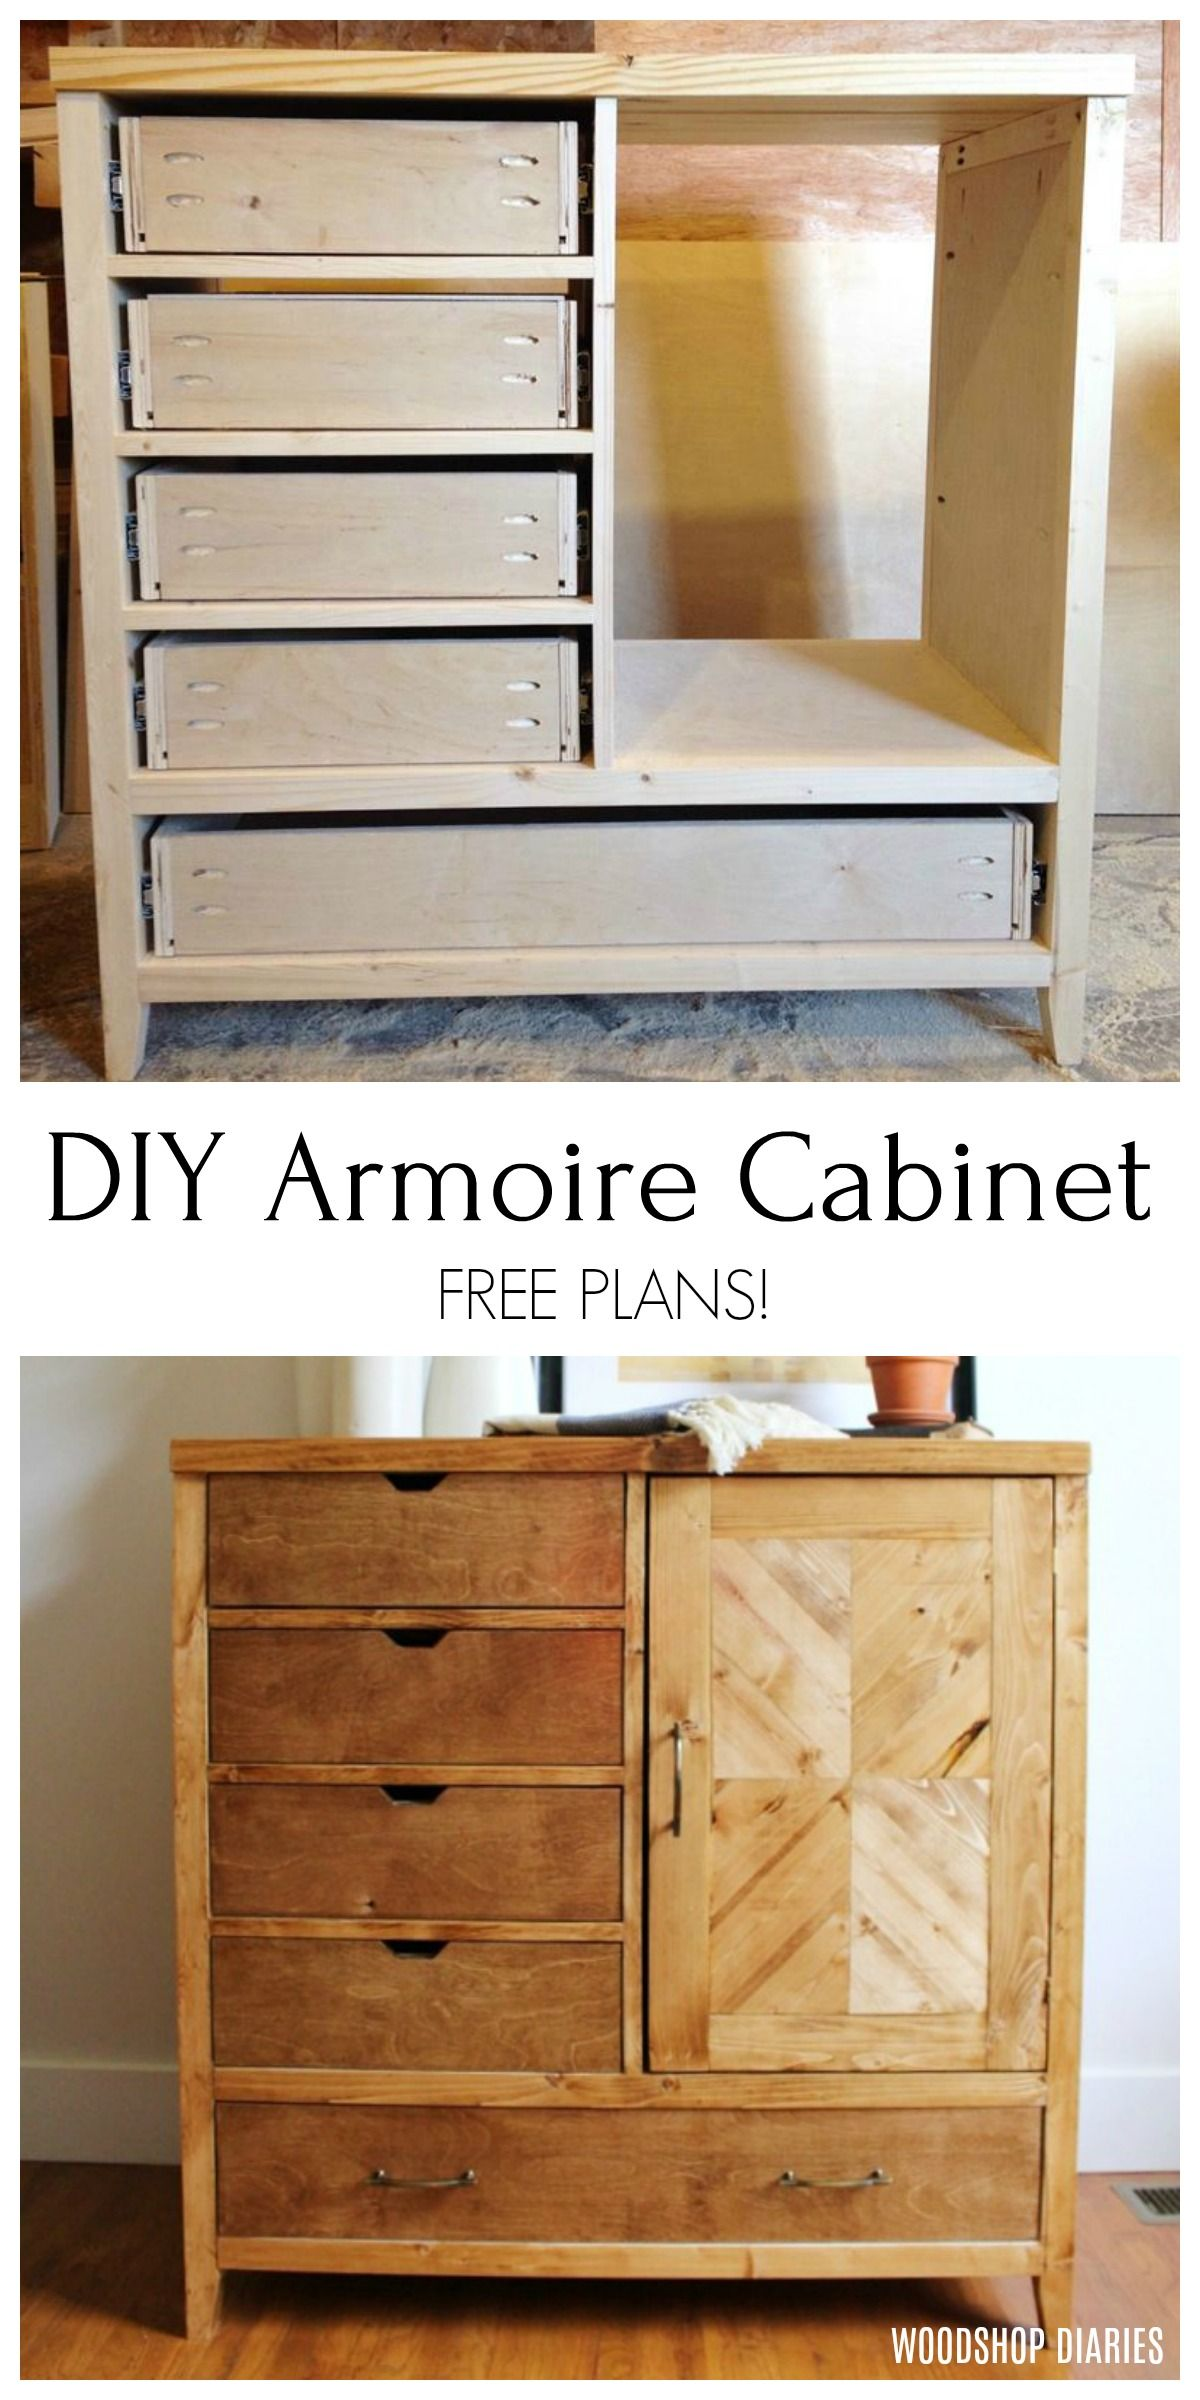 How To Build A Modern Diy Dresser Armoire Diy Dresser Plans Armoire Furniture Plans Diy Dresser [ 2400 x 1200 Pixel ]